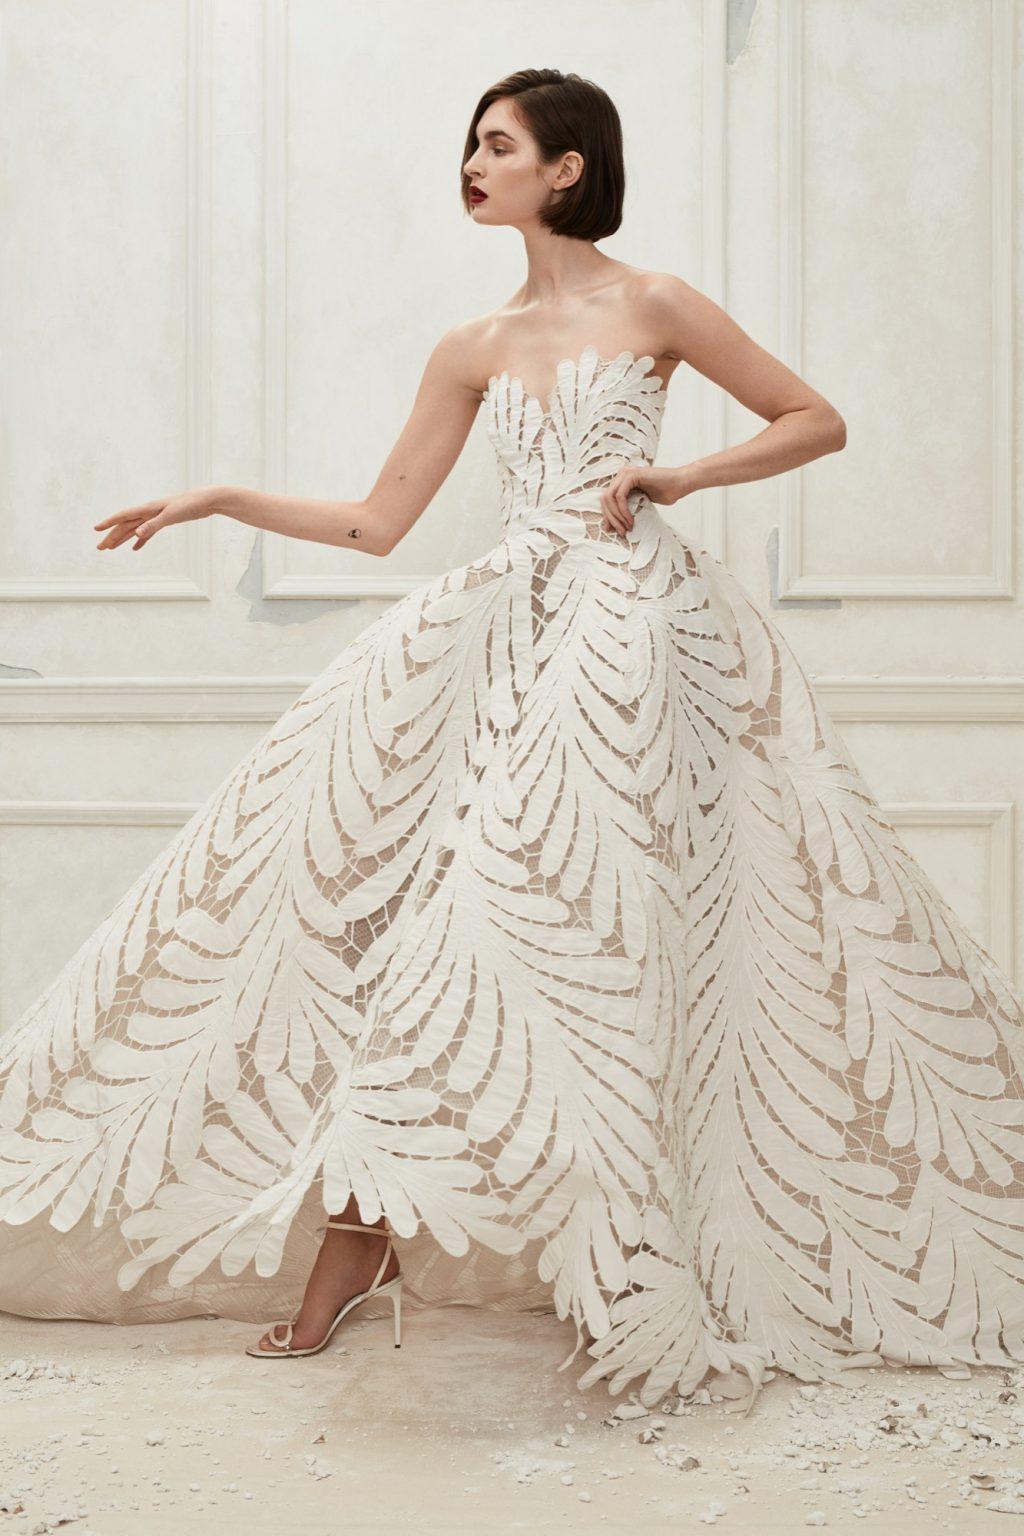 0a59a05b5f18b فساتين زفاف - أجمل فساتين الزفاف من مصممين عرب وعالميين – Styly